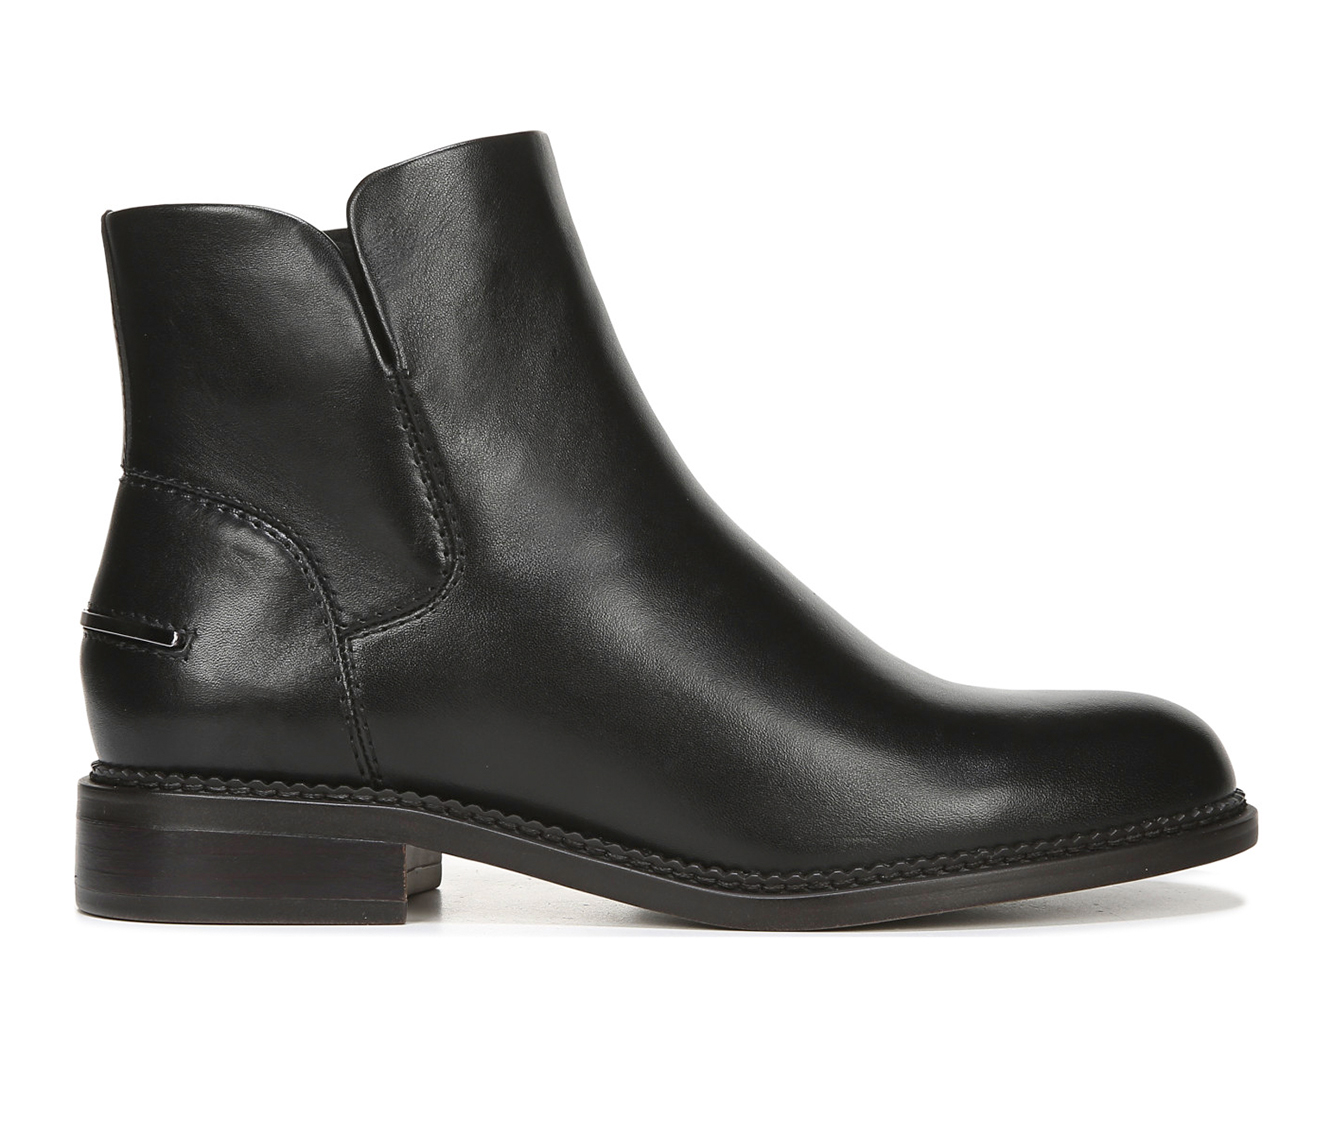 Franco Sarto Happily Women's Boot (Black Leather)